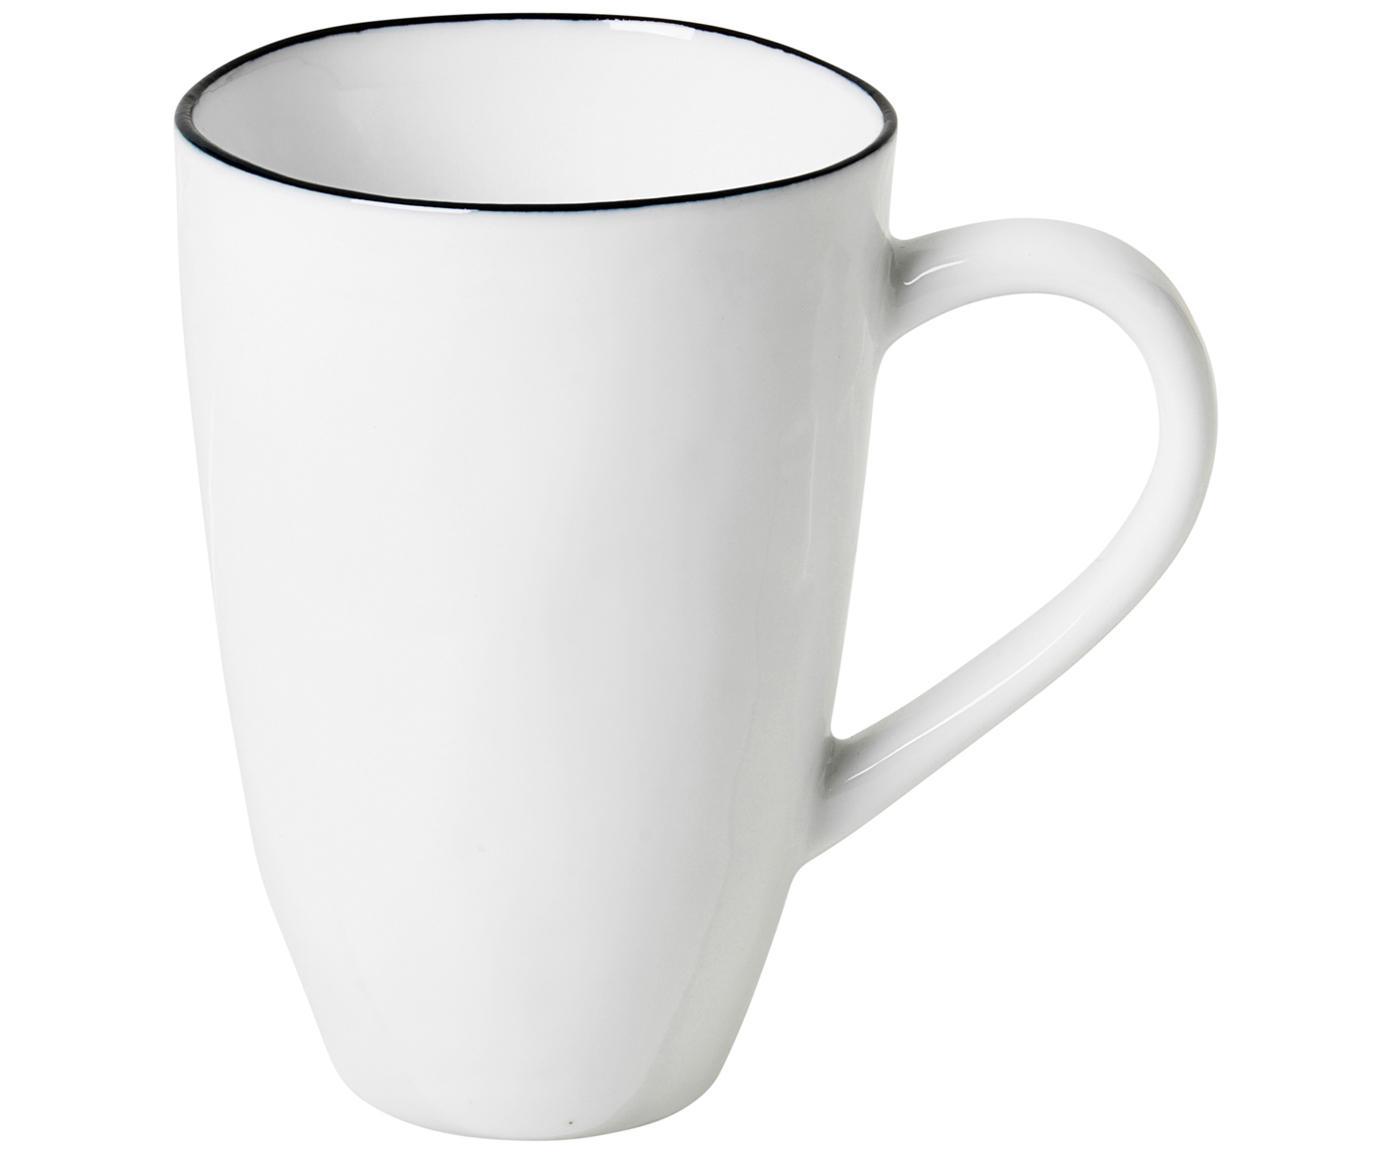 Tazza fatta a mano Salt 6 pz, Porcellana, Bianco latteo, nero, Ø 8  x Alt. 12 cm